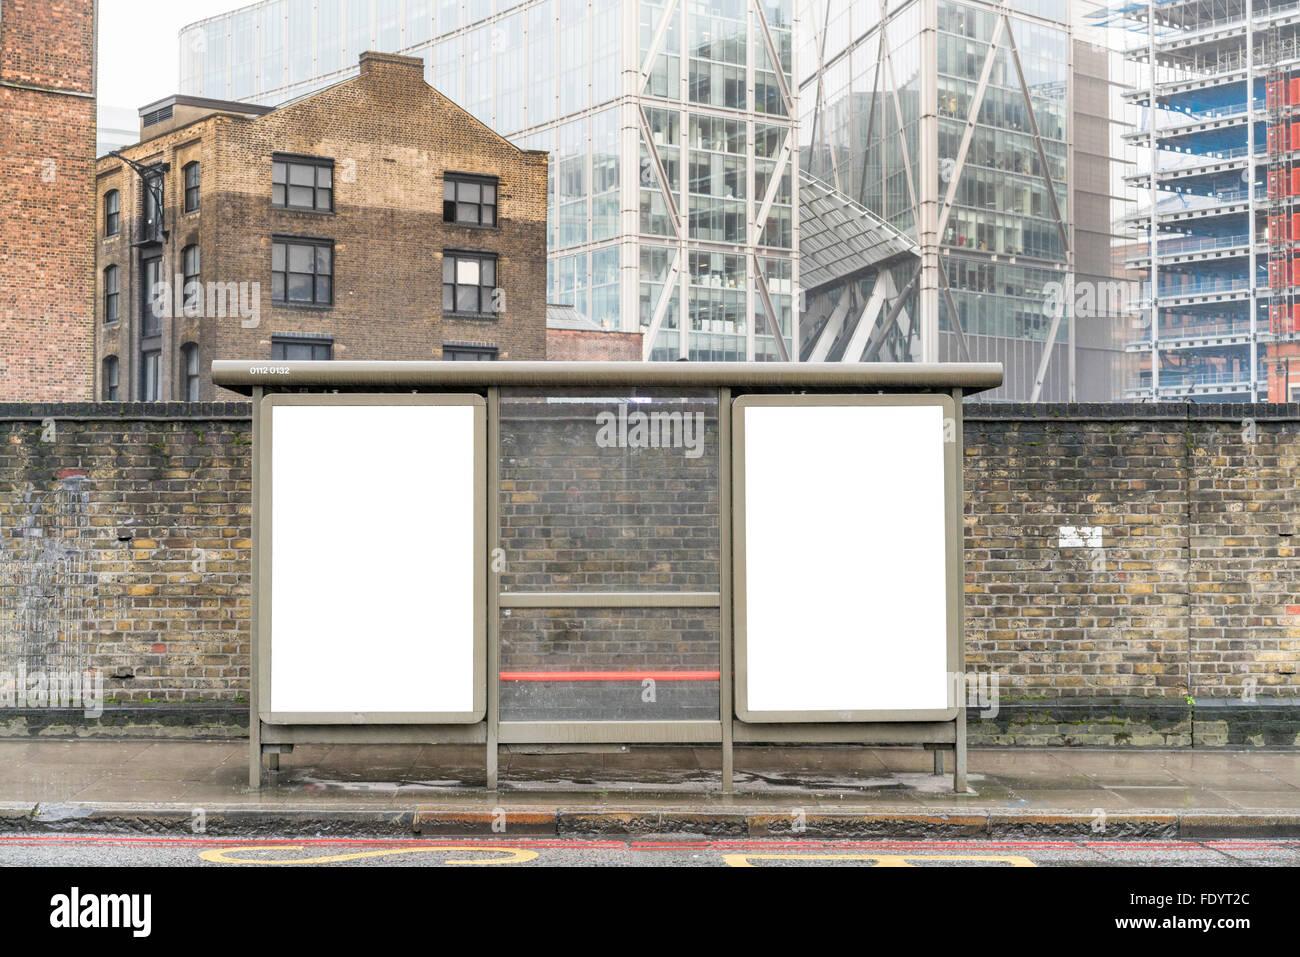 BLANK TEMPLATE BILLBOARD POSTER ON LONDON STREET, UNITED KINGDOM, HIGH QUALITY - Stock Image